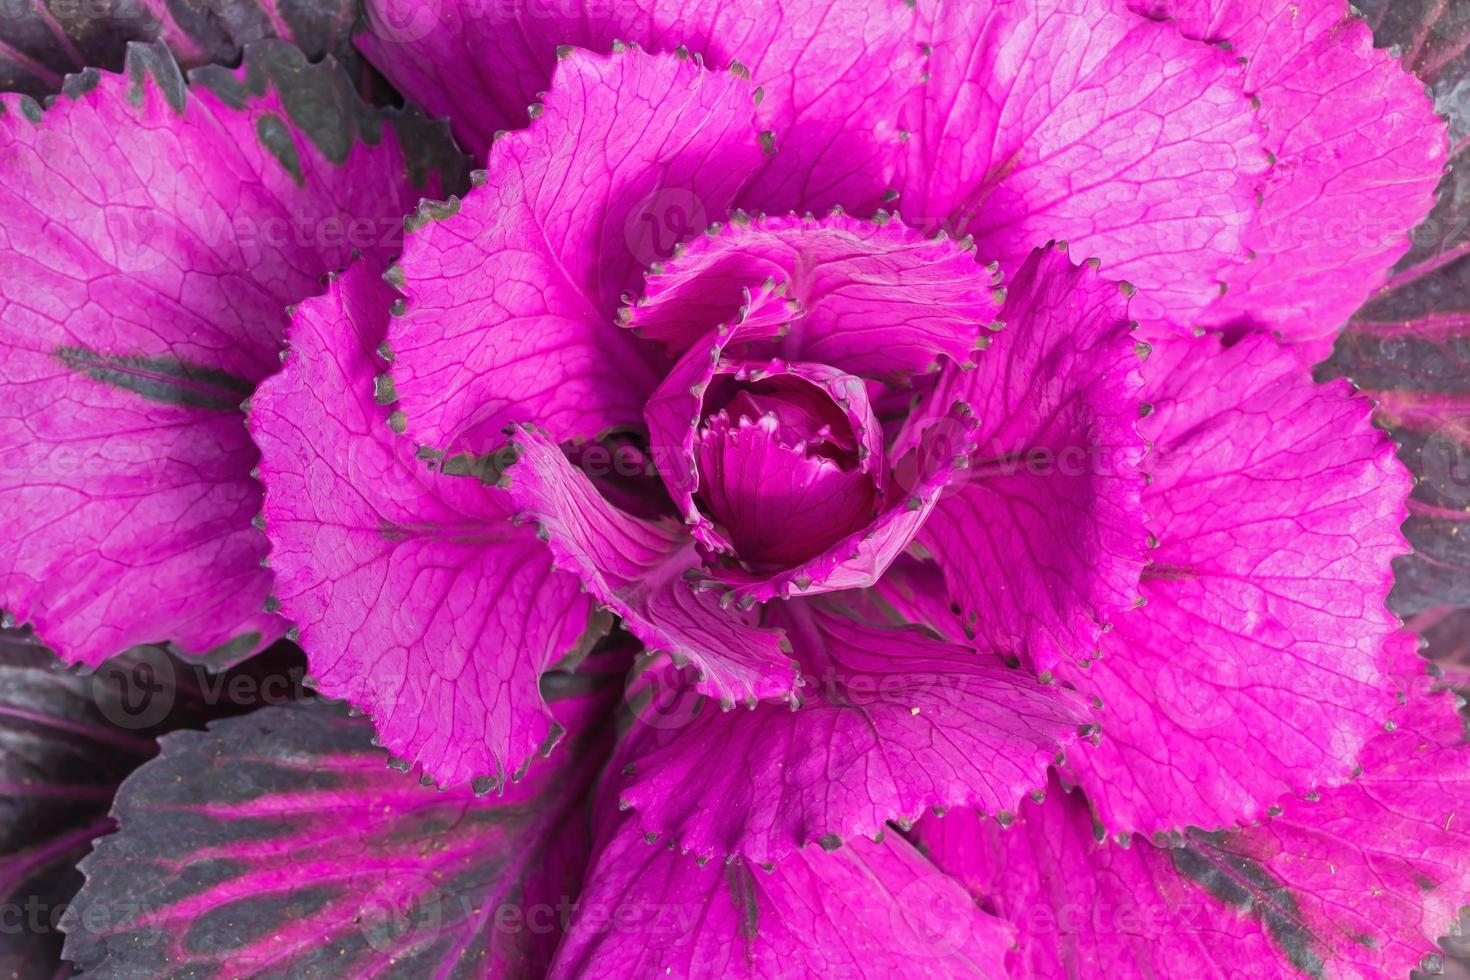 Decorative cabbage photo